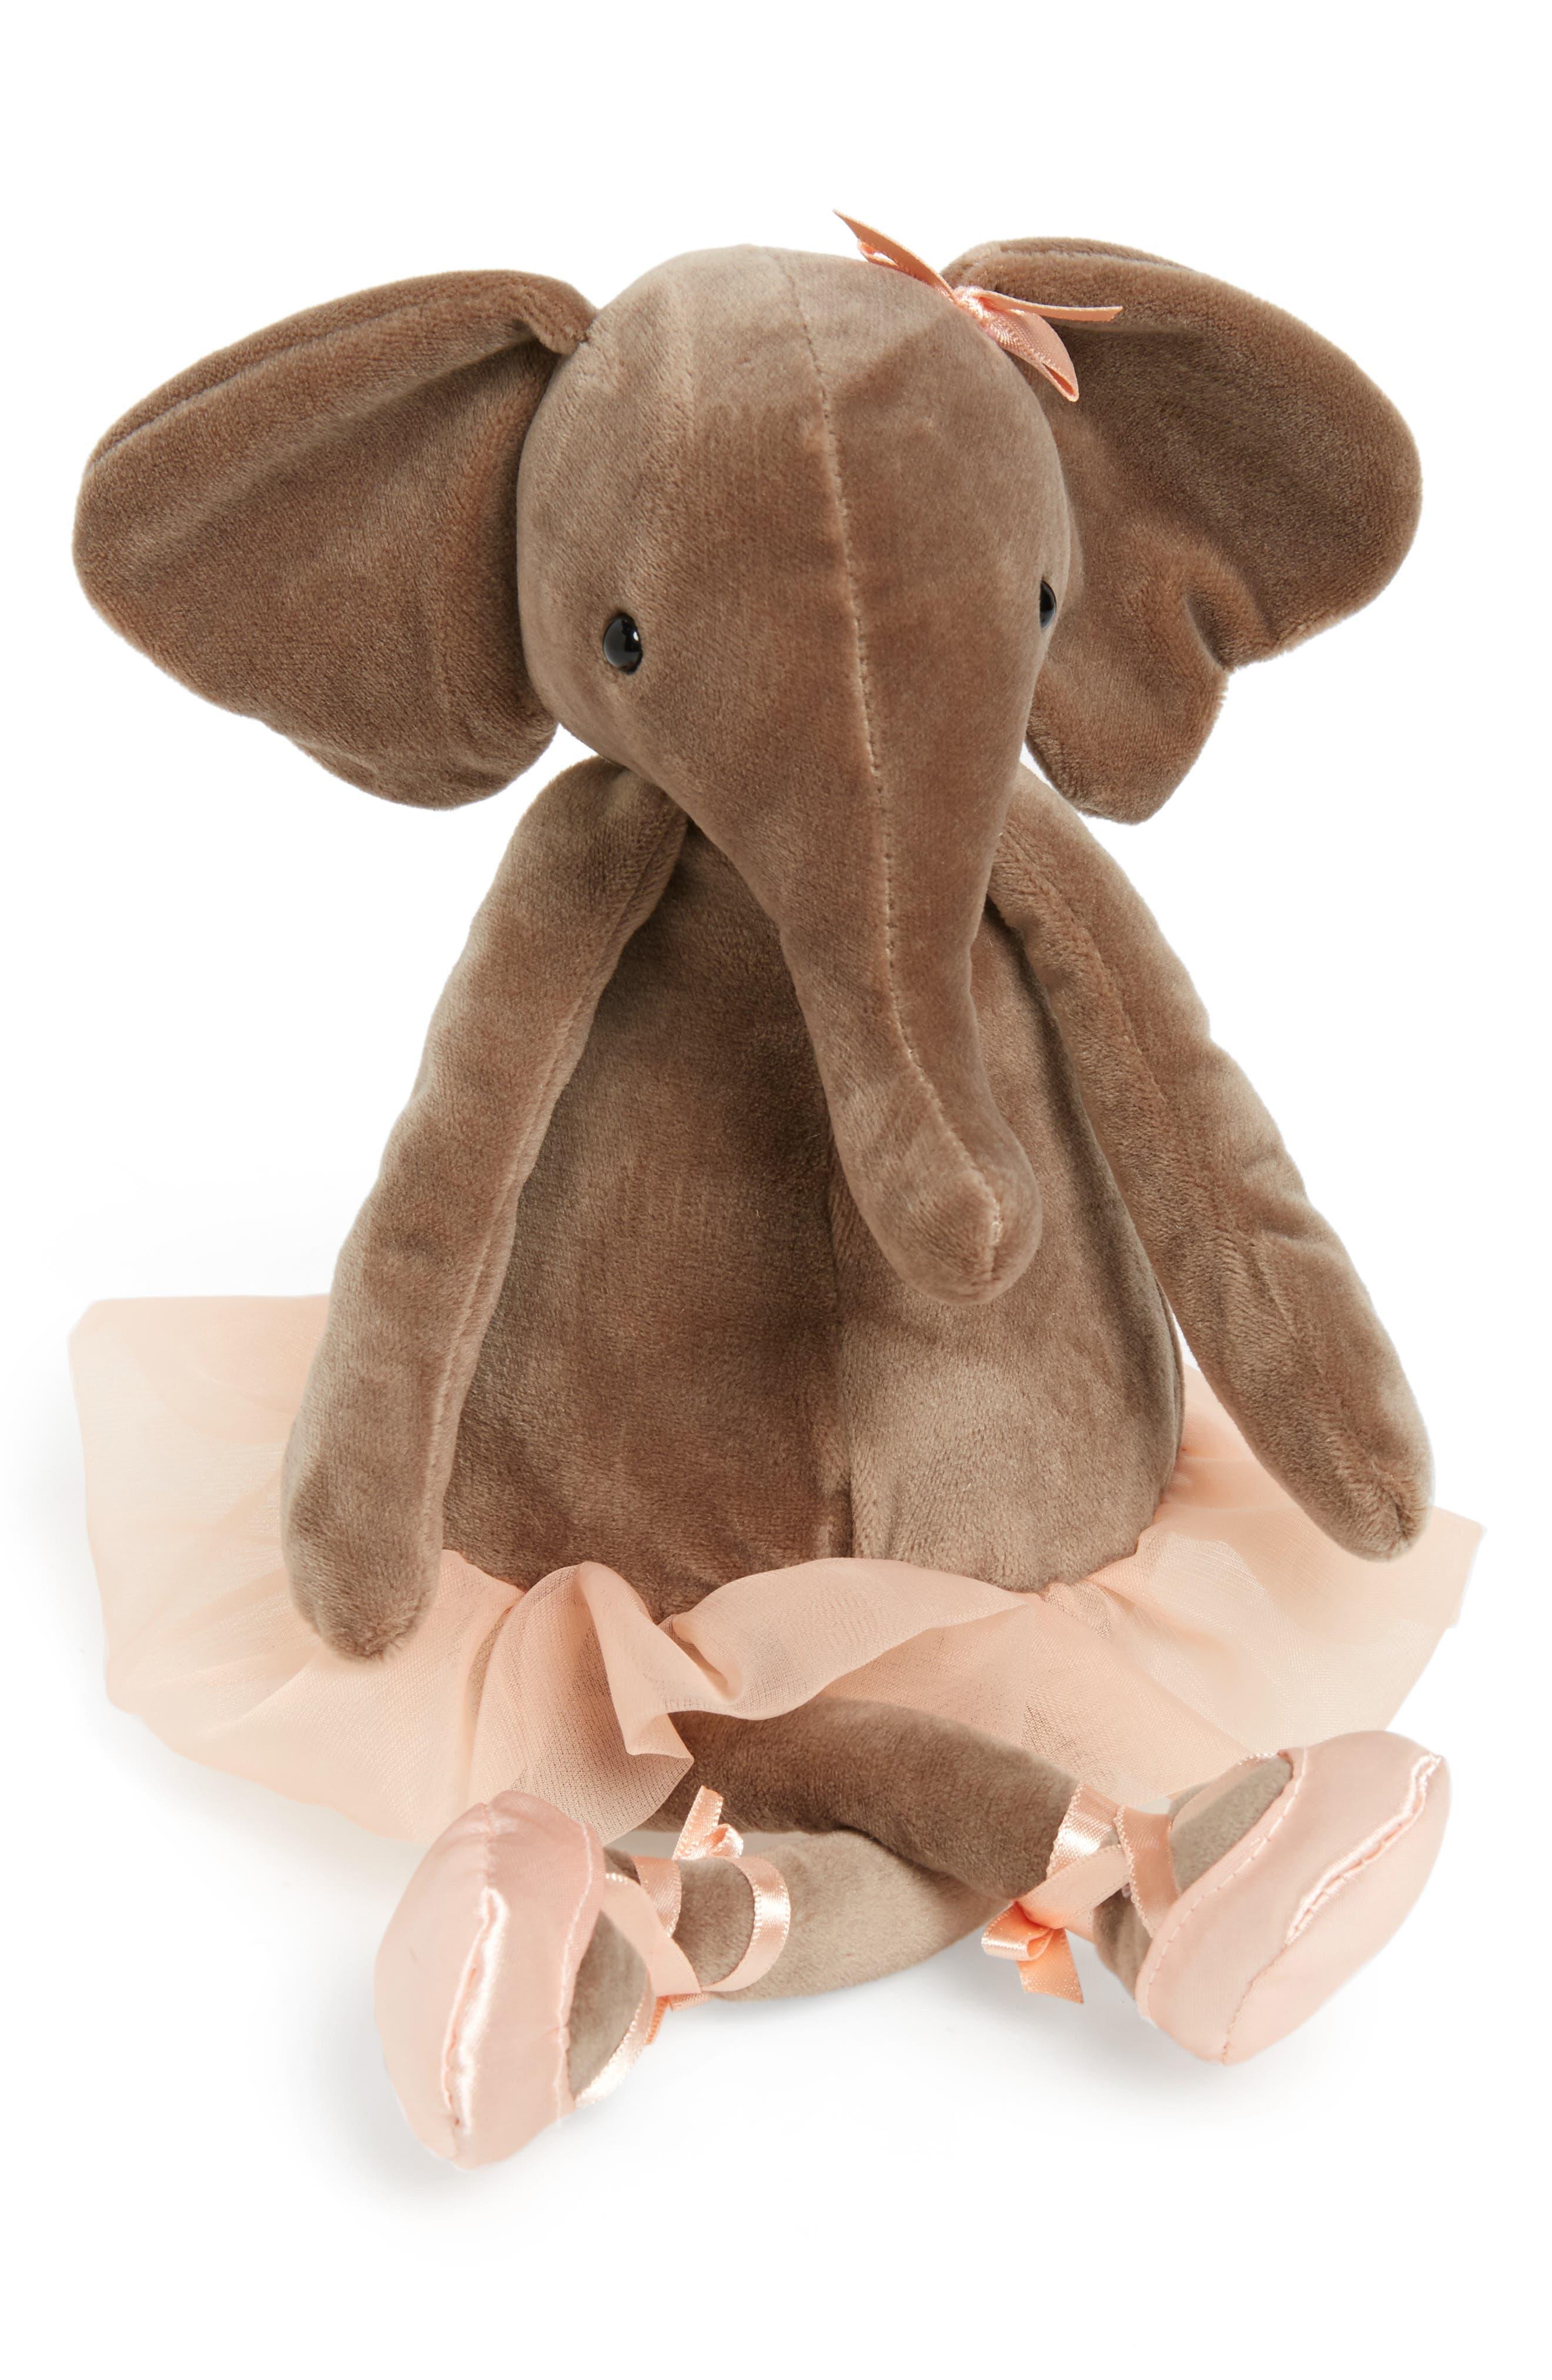 Dancing Darcey - Elephant Stuffed Animal,                         Main,                         color, 200